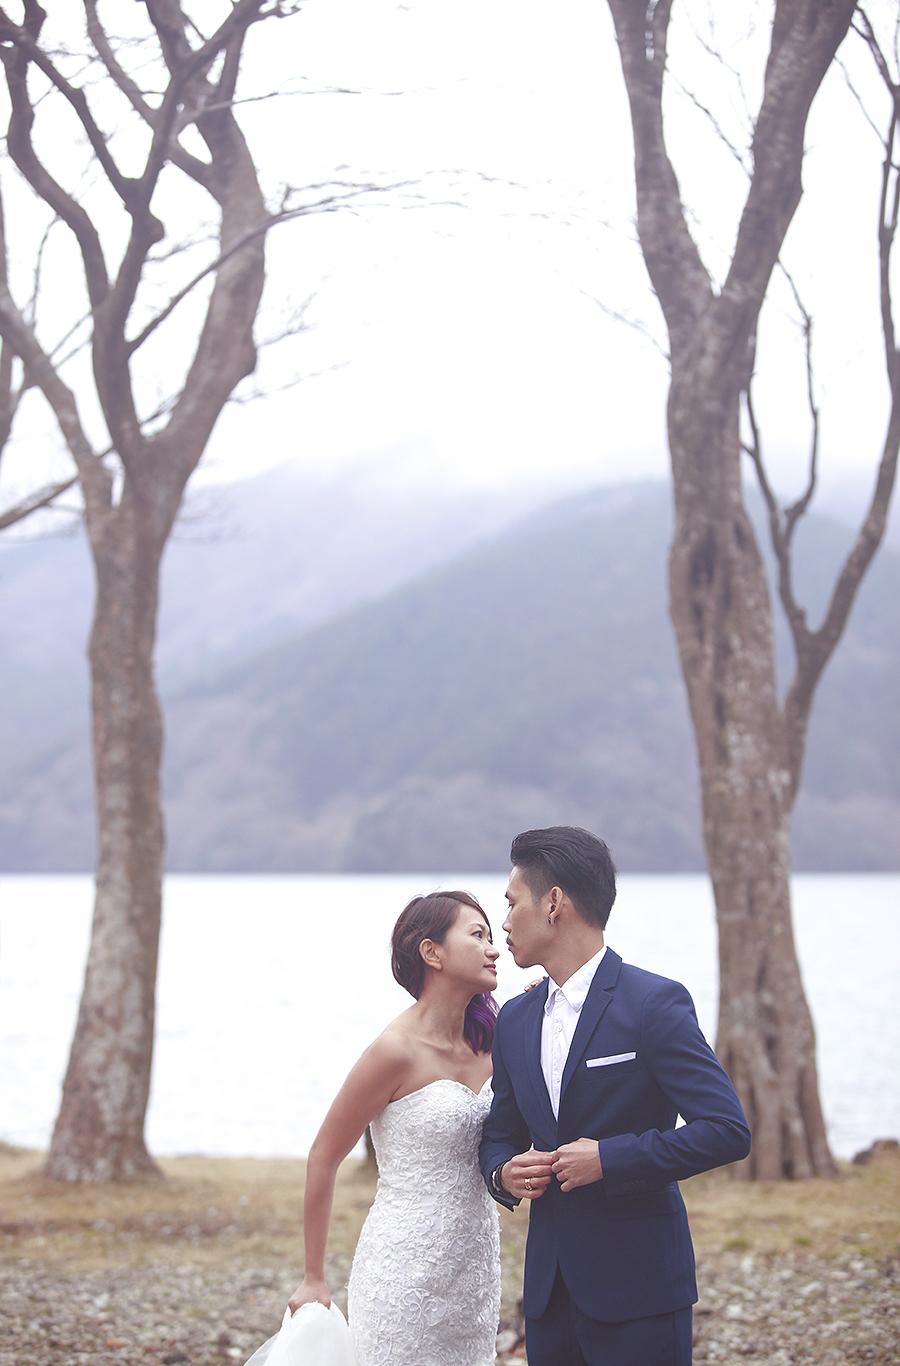 tokyo hakone japan spring sakura . engagement wedding photography by kurt ahs . ns + eu . 0380.jpg